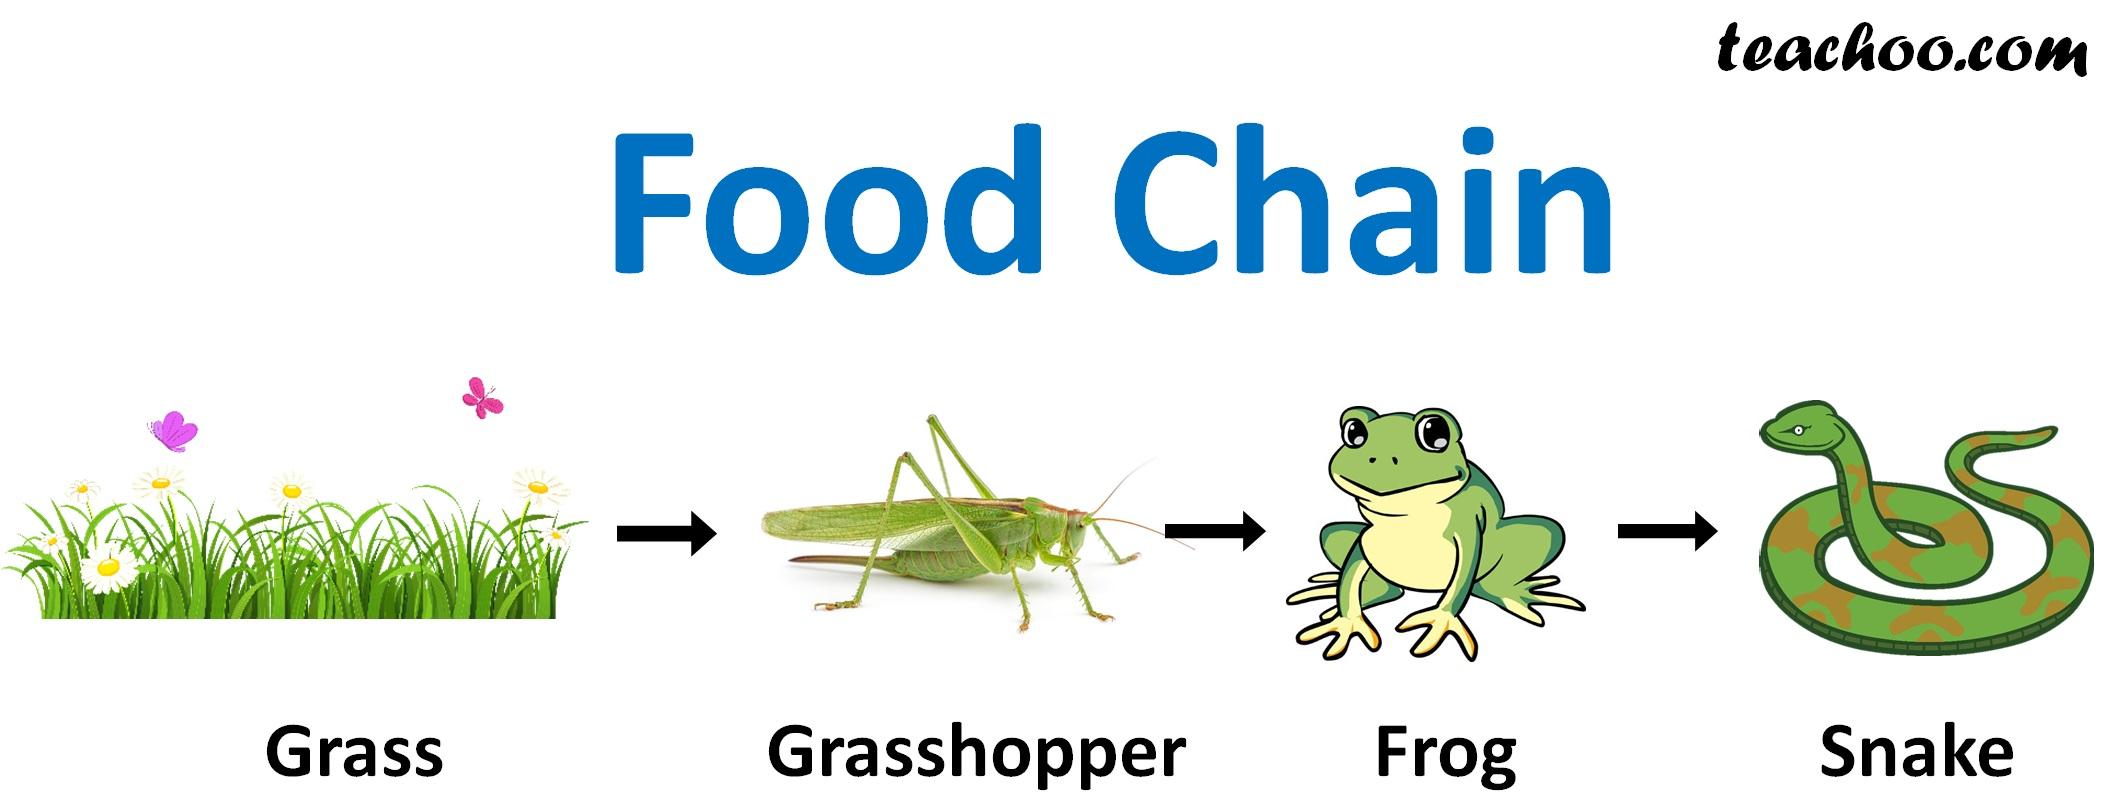 Food Chain Q1 Page 260 - Teachoo.jpg